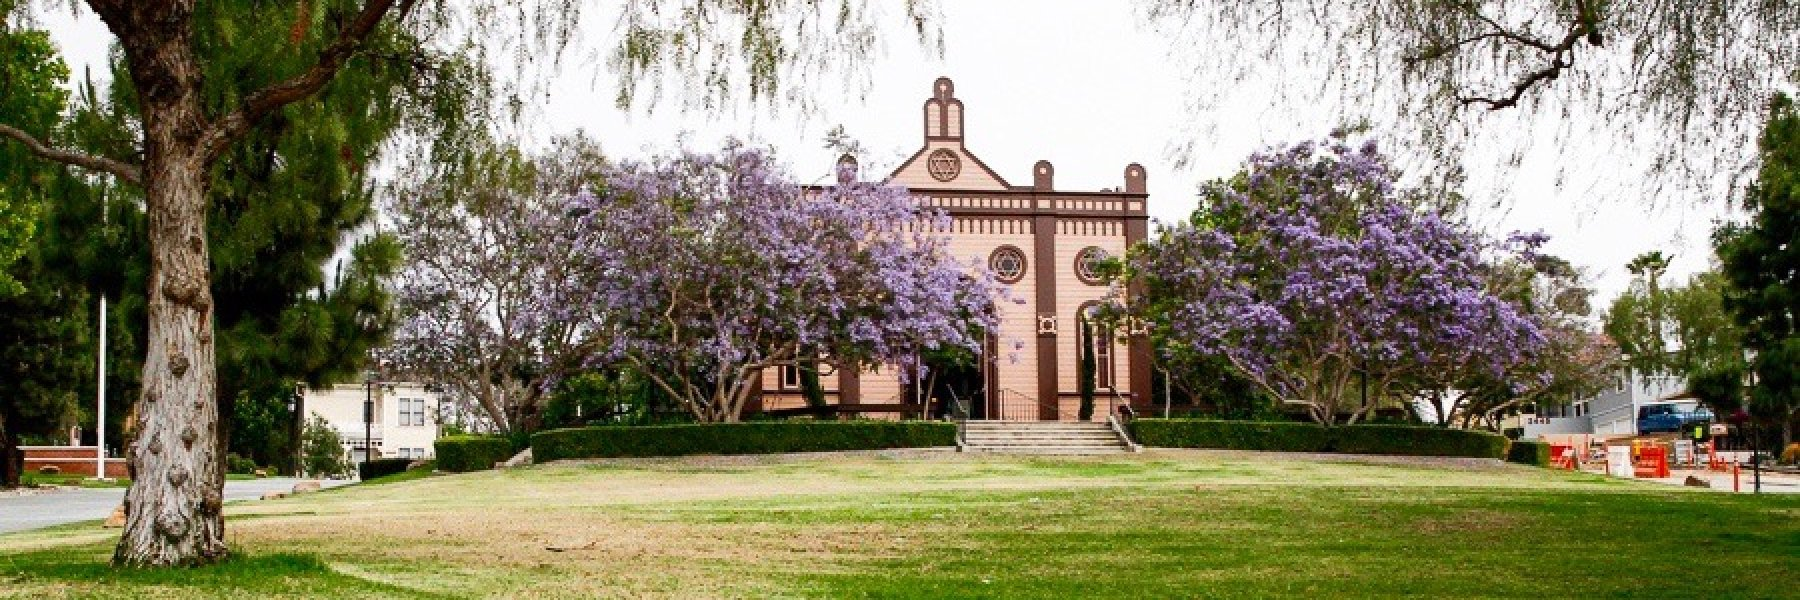 Presidio Hills is a community of homes in San Diego California